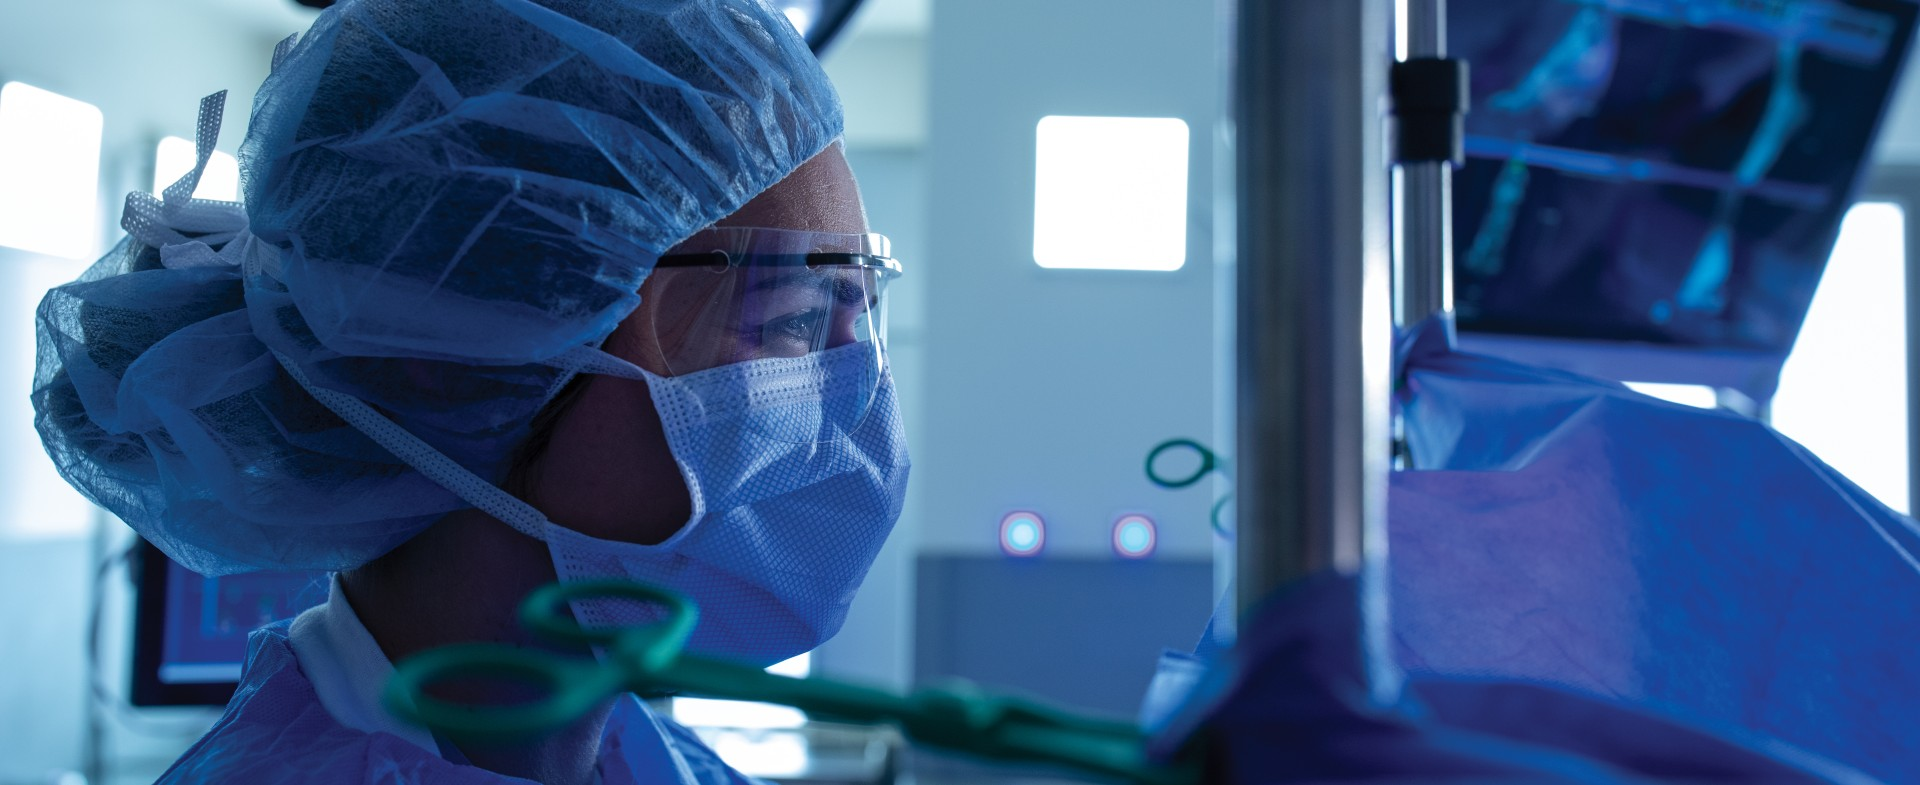 a close up of a TGH orthopedic surgeon